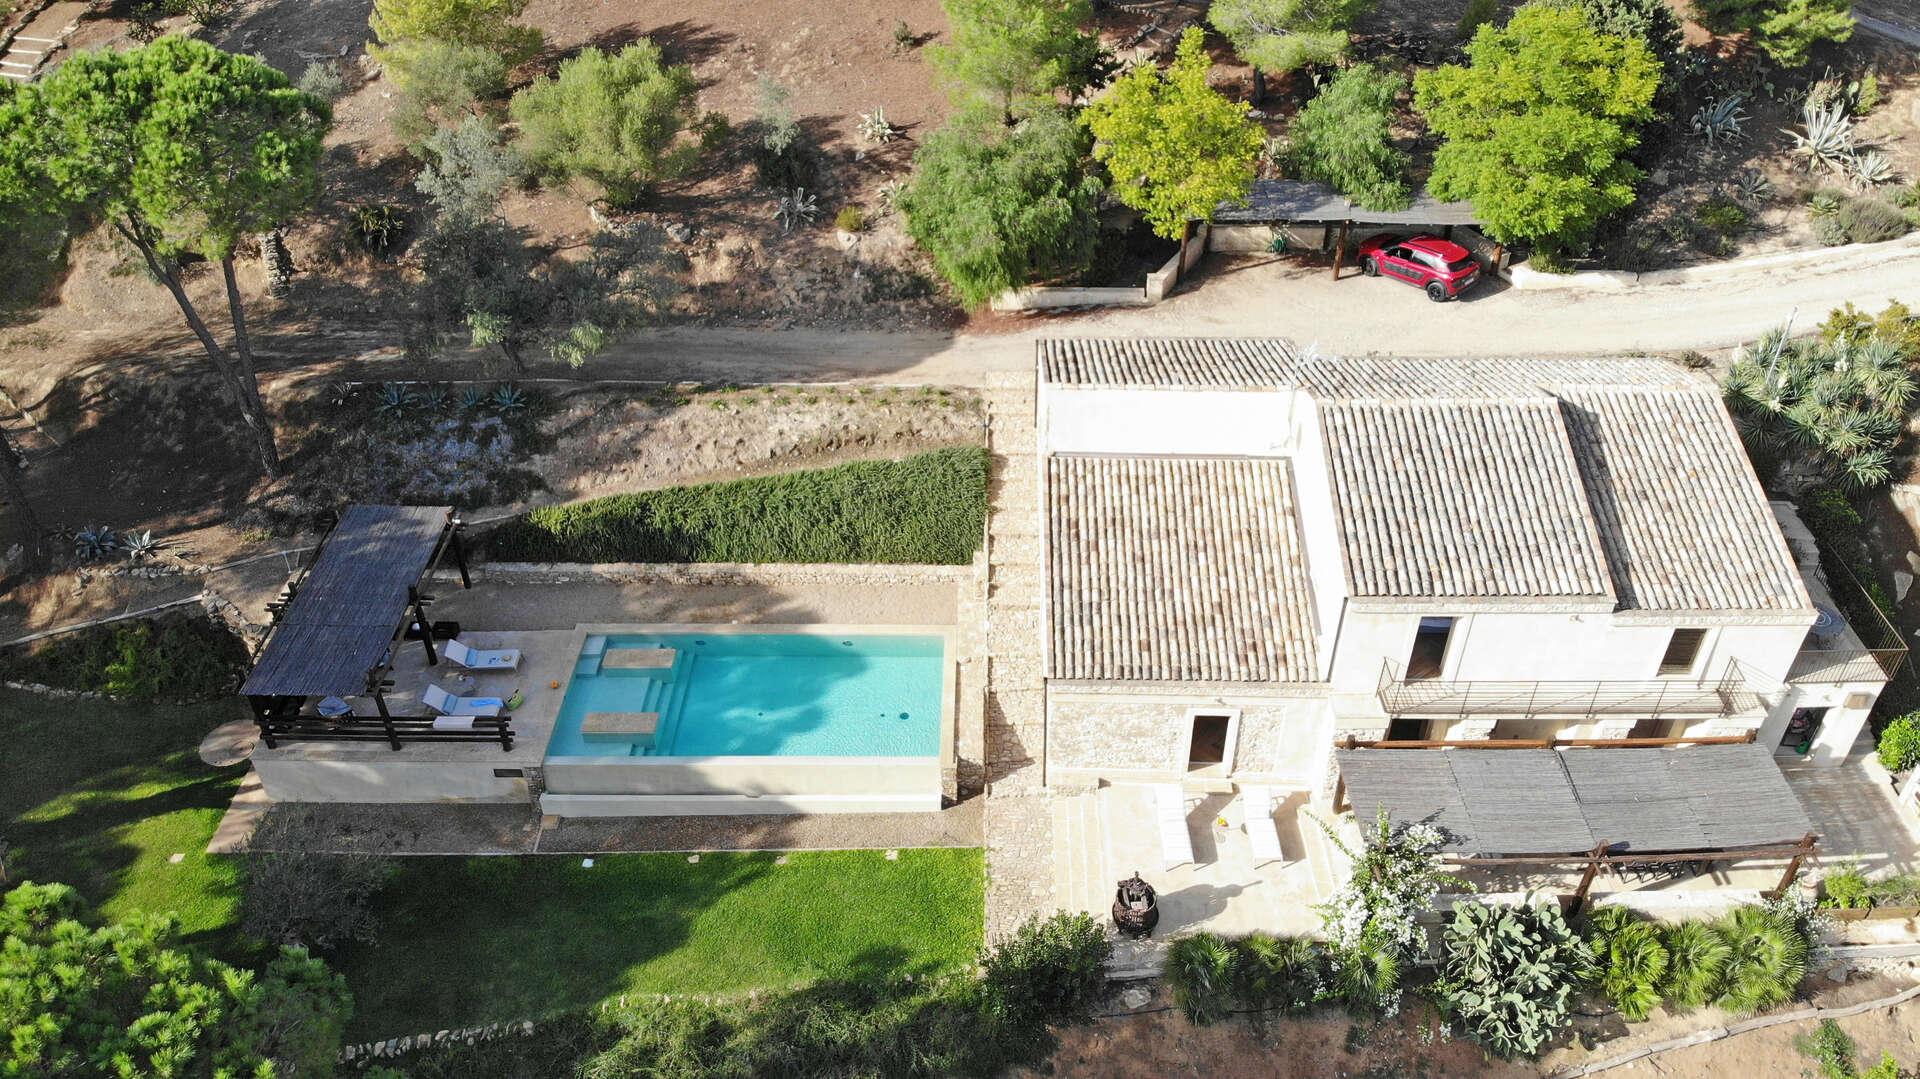 Luxury vacation rentals europe - Italy - Sicily - Catania - Villa Palmento - Image 1/43